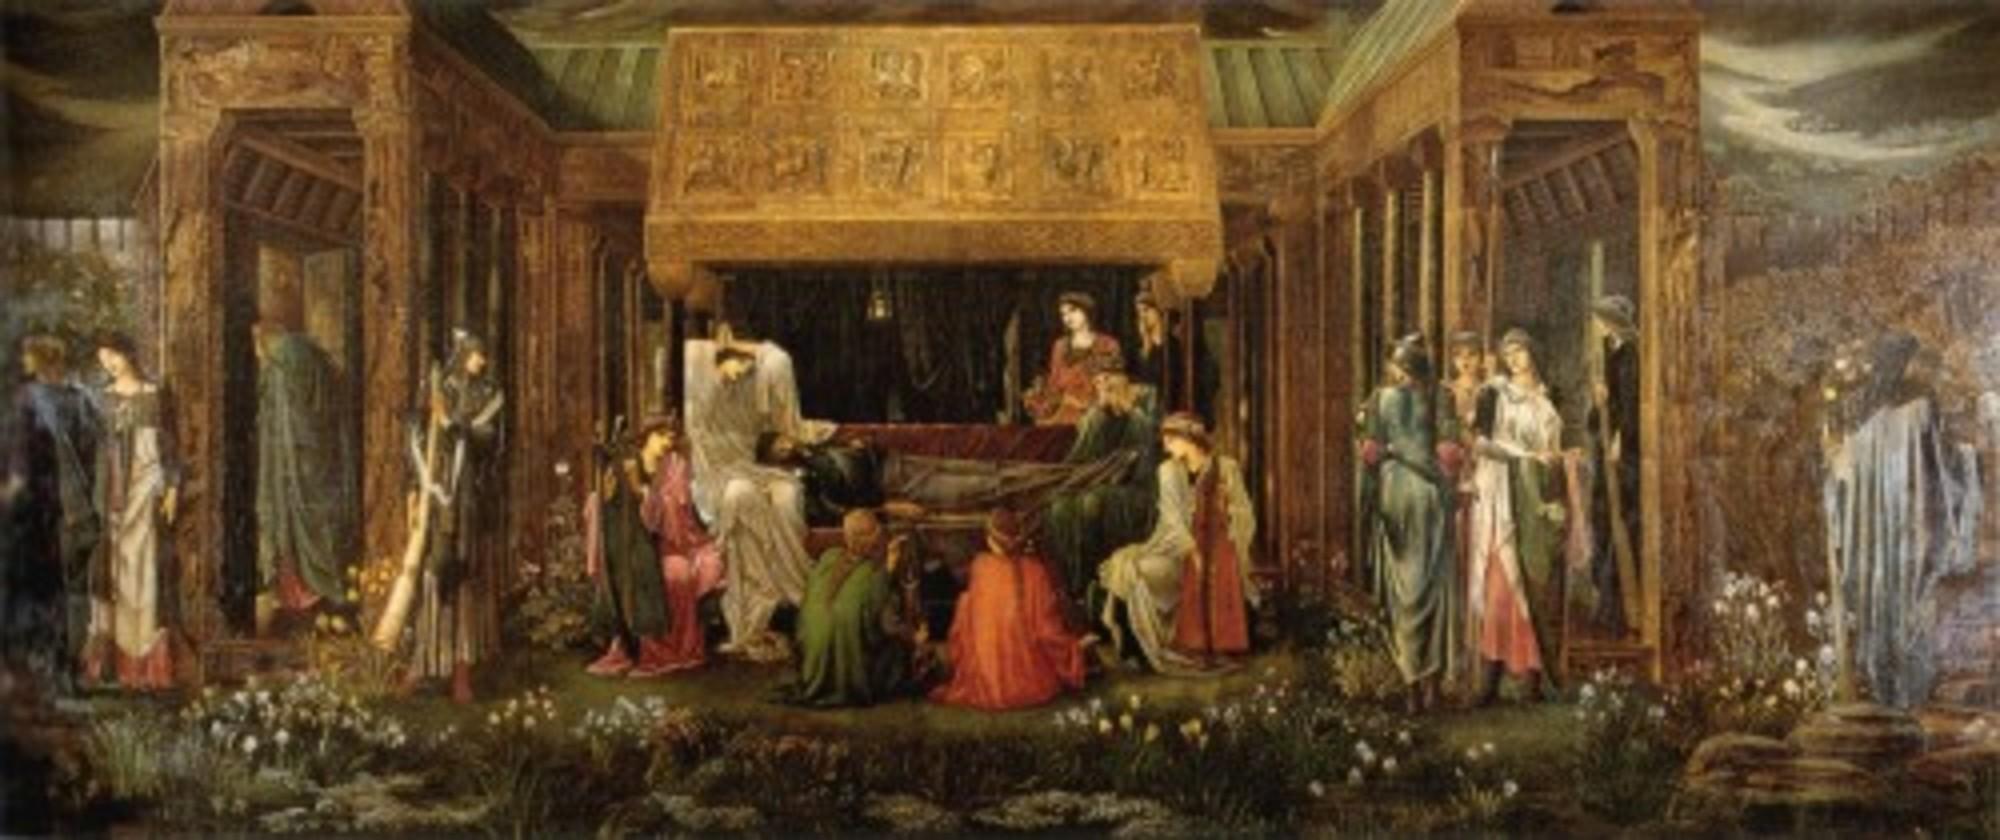 Burne-Jones_Last_Sleep_of_Arthur_in_Avalon_v2.jpg